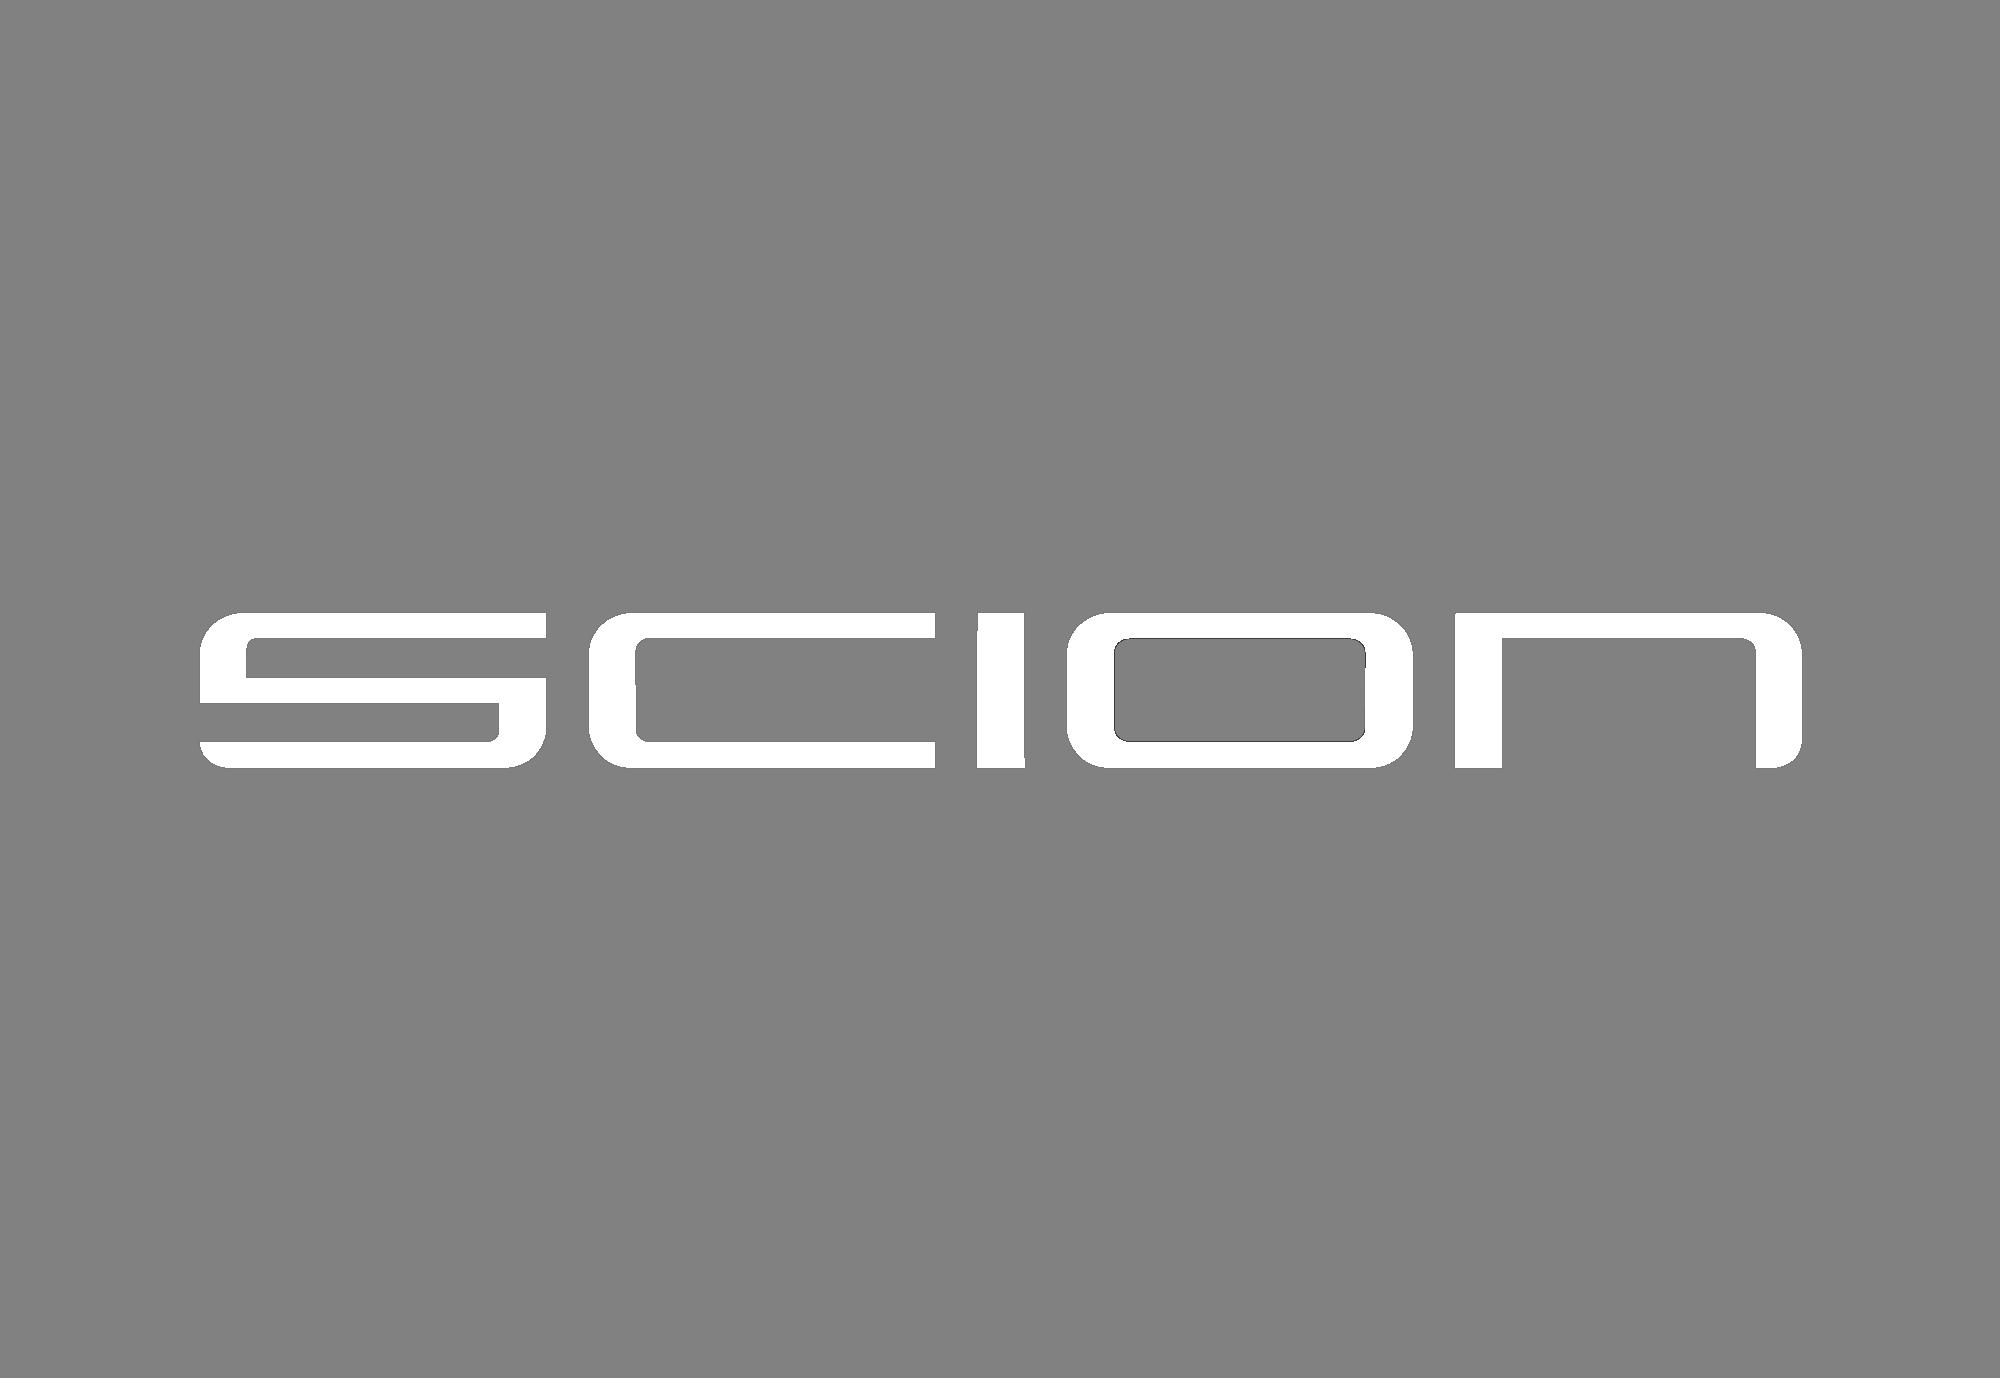 Scion_logo copy.png